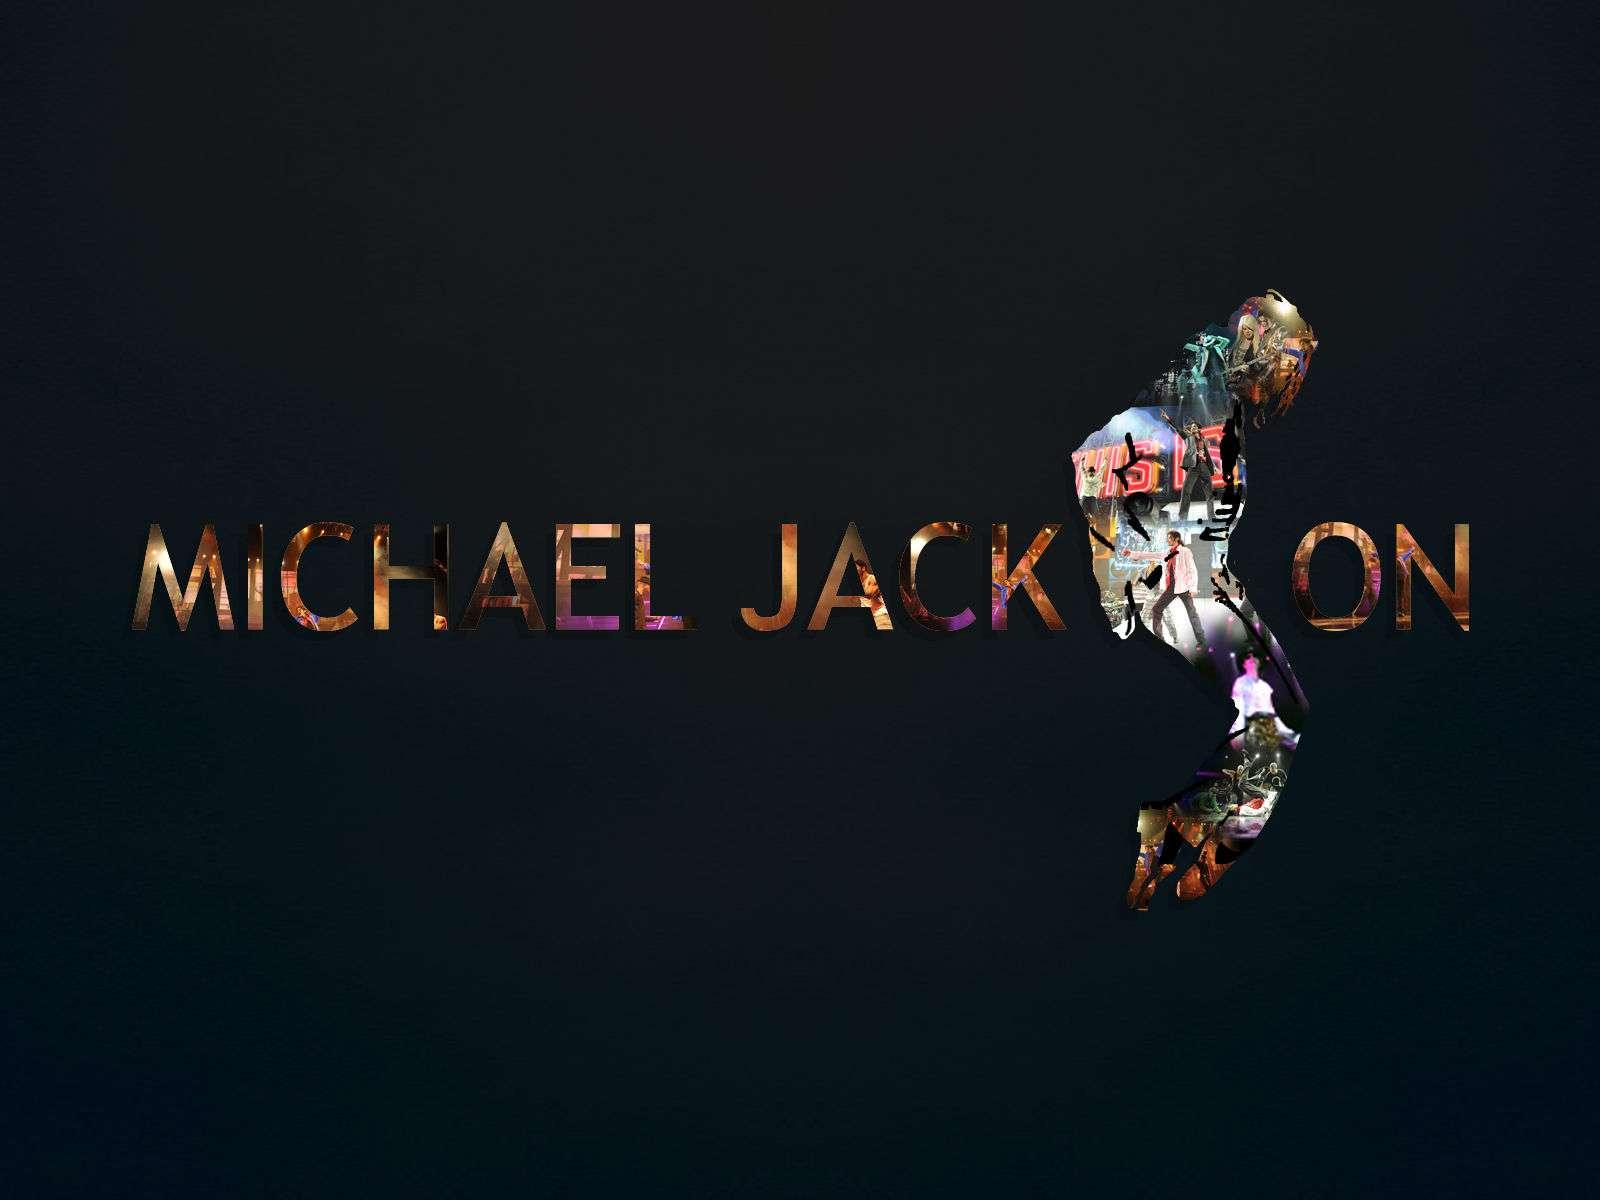 Michael Jackson Wallpaper 046